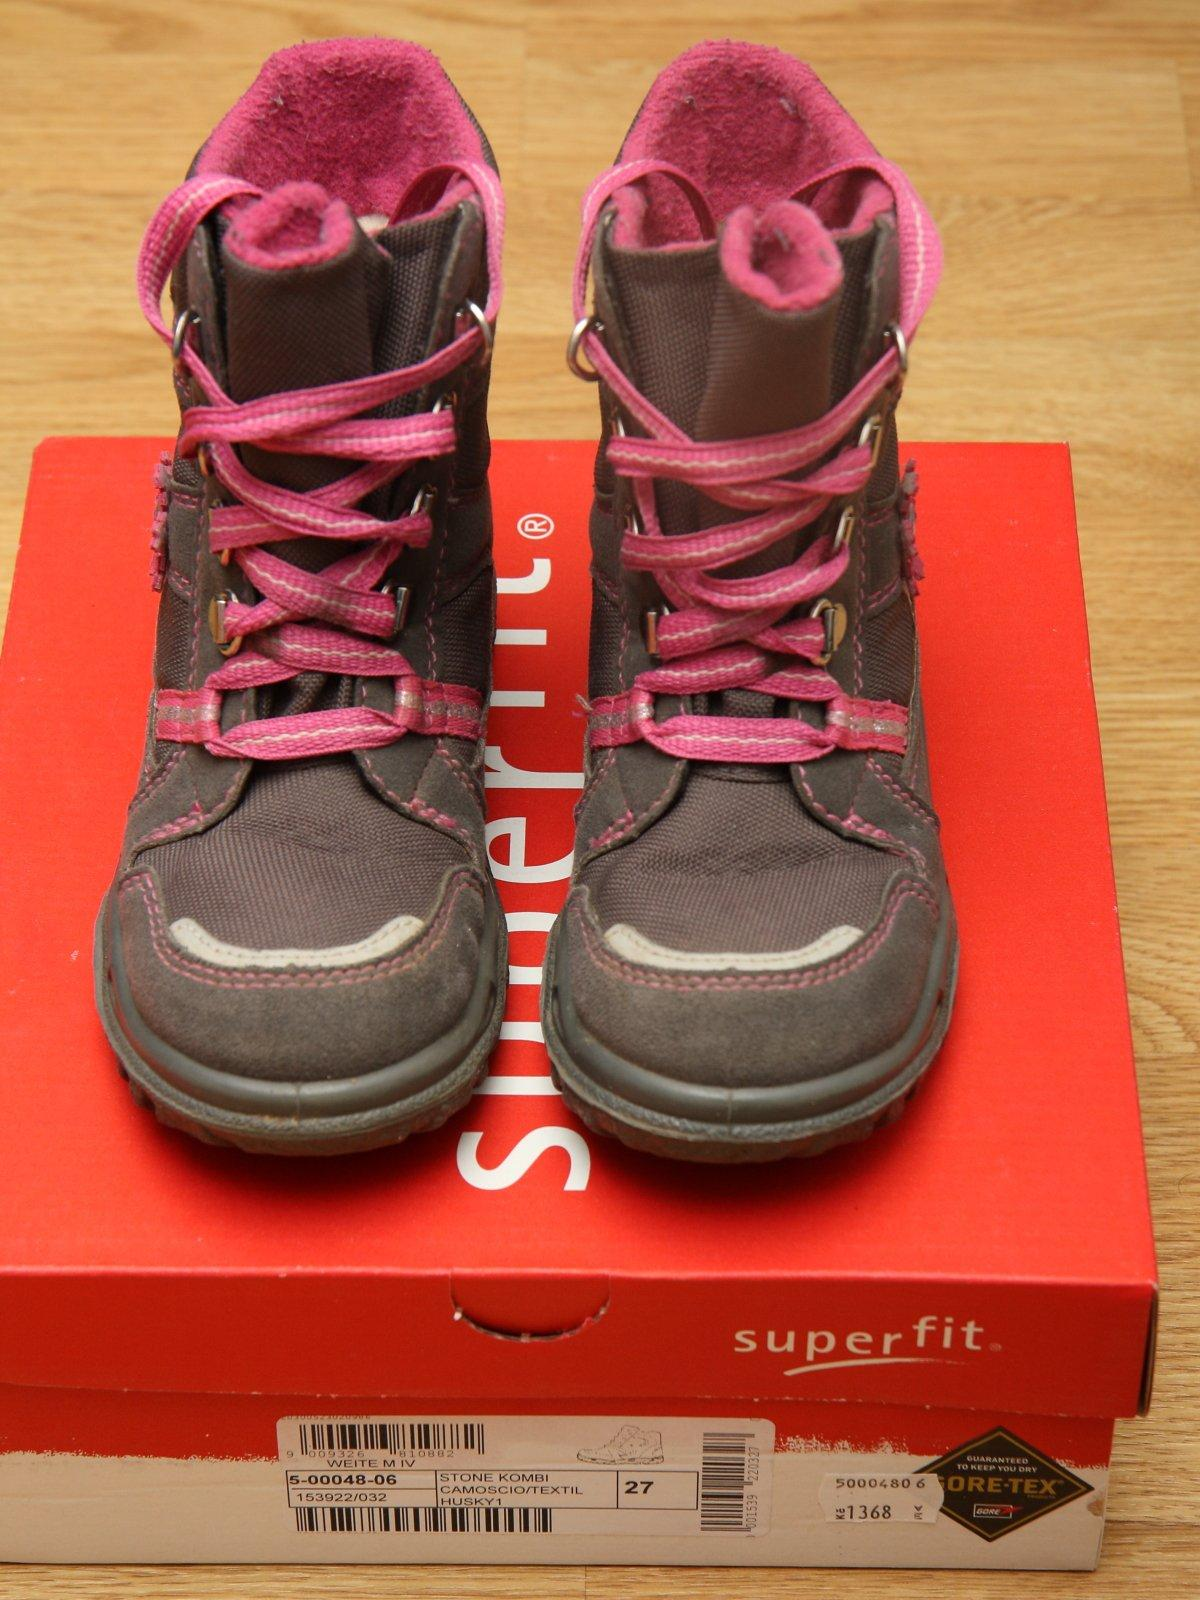 Zimní boty superfit s goretexem 69f21bf517